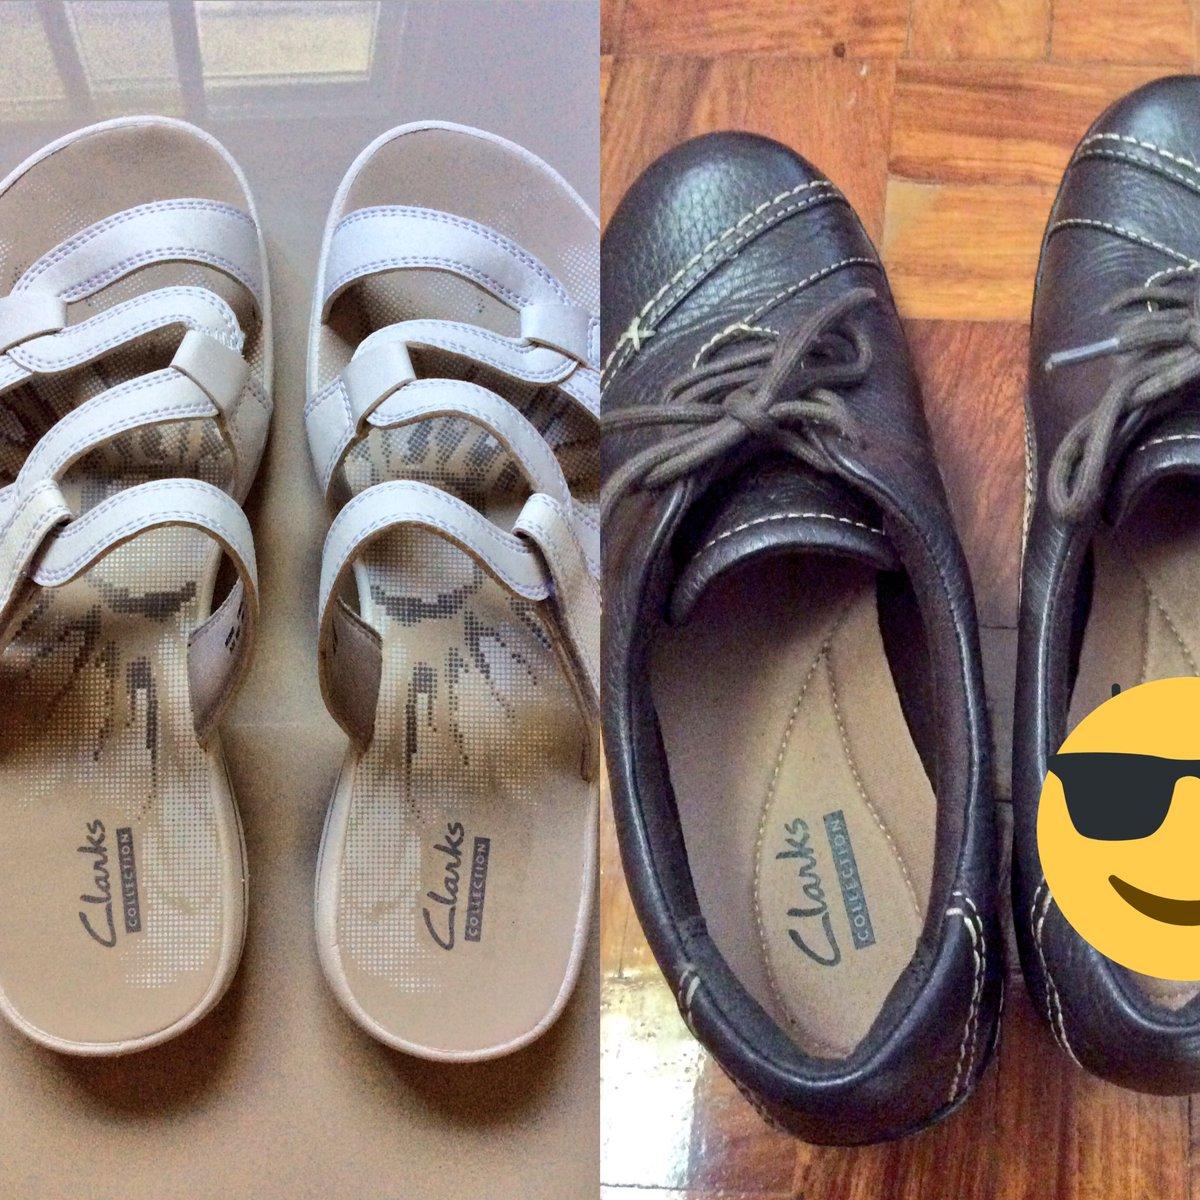 1c3e6202531 clarksfootwear hashtag on Twitter